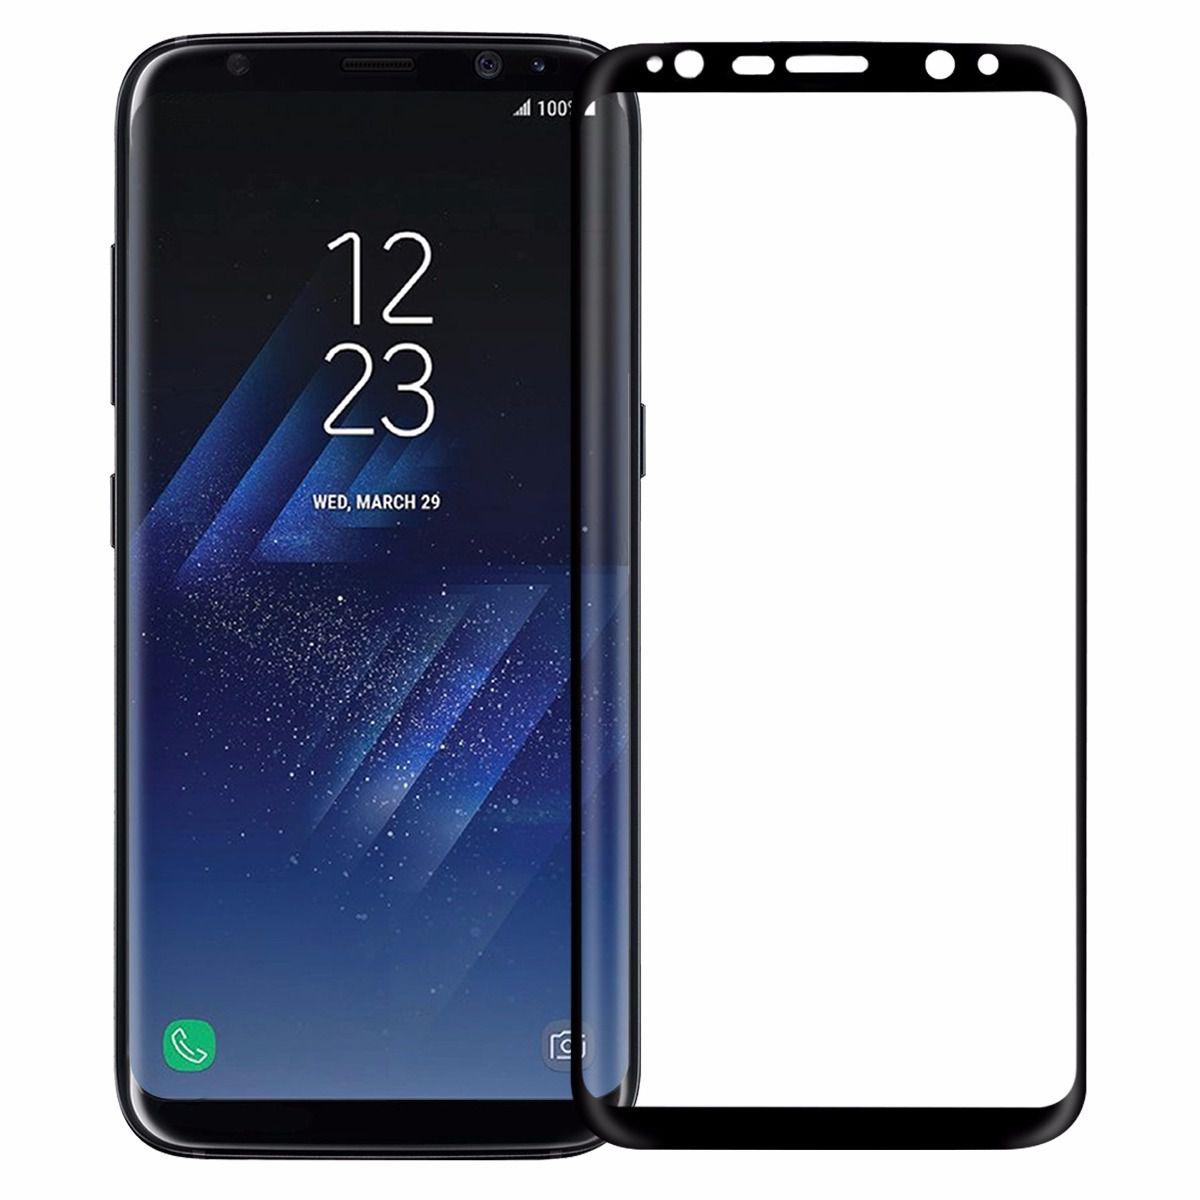 Pelicula de vidro Samsung s8 Plus 3D